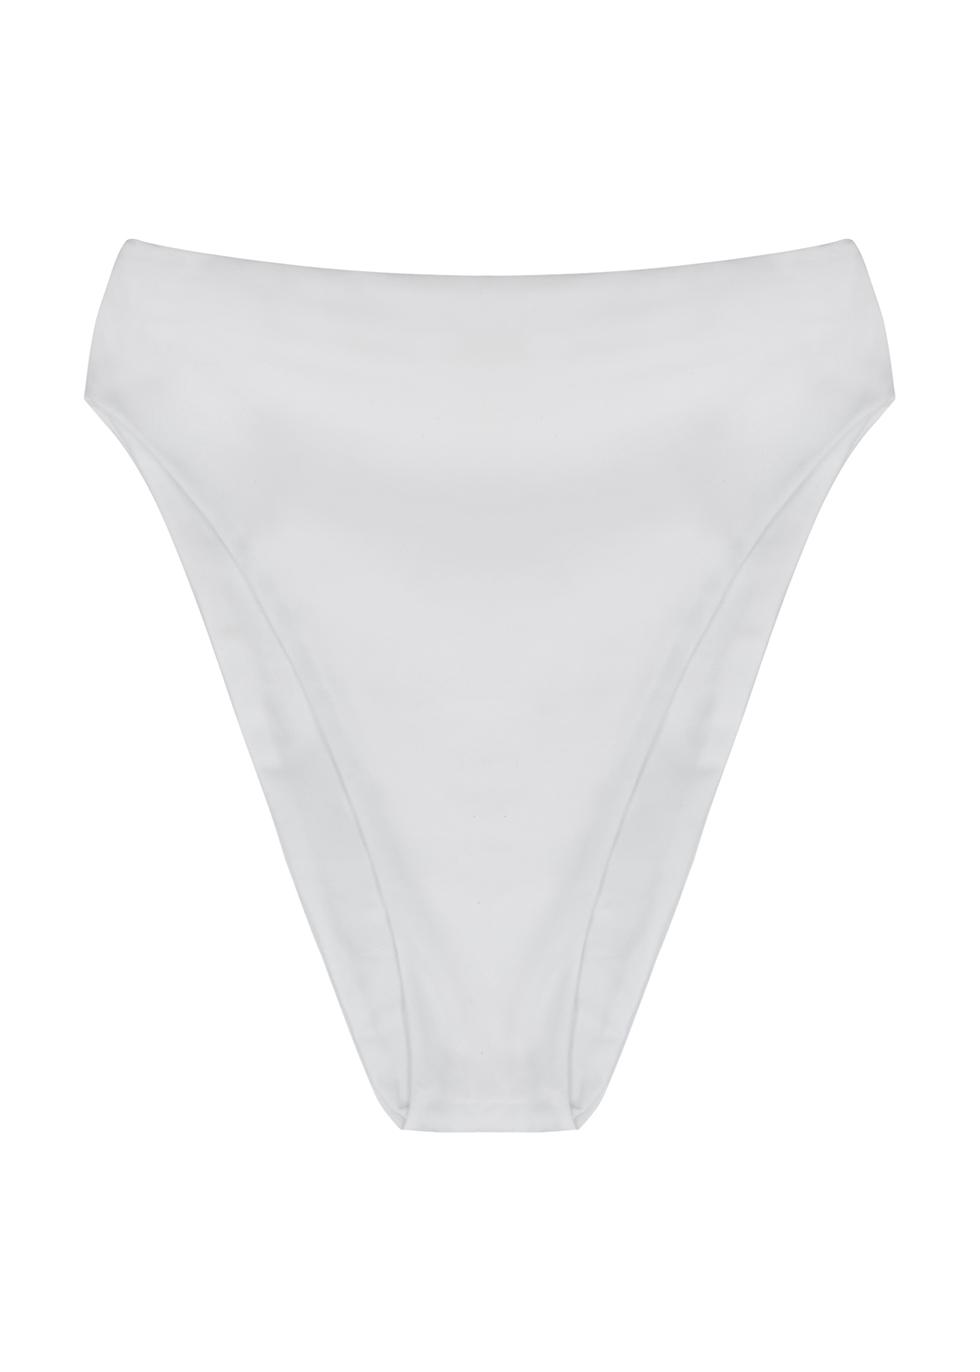 Incline white high-rise bikini briefs